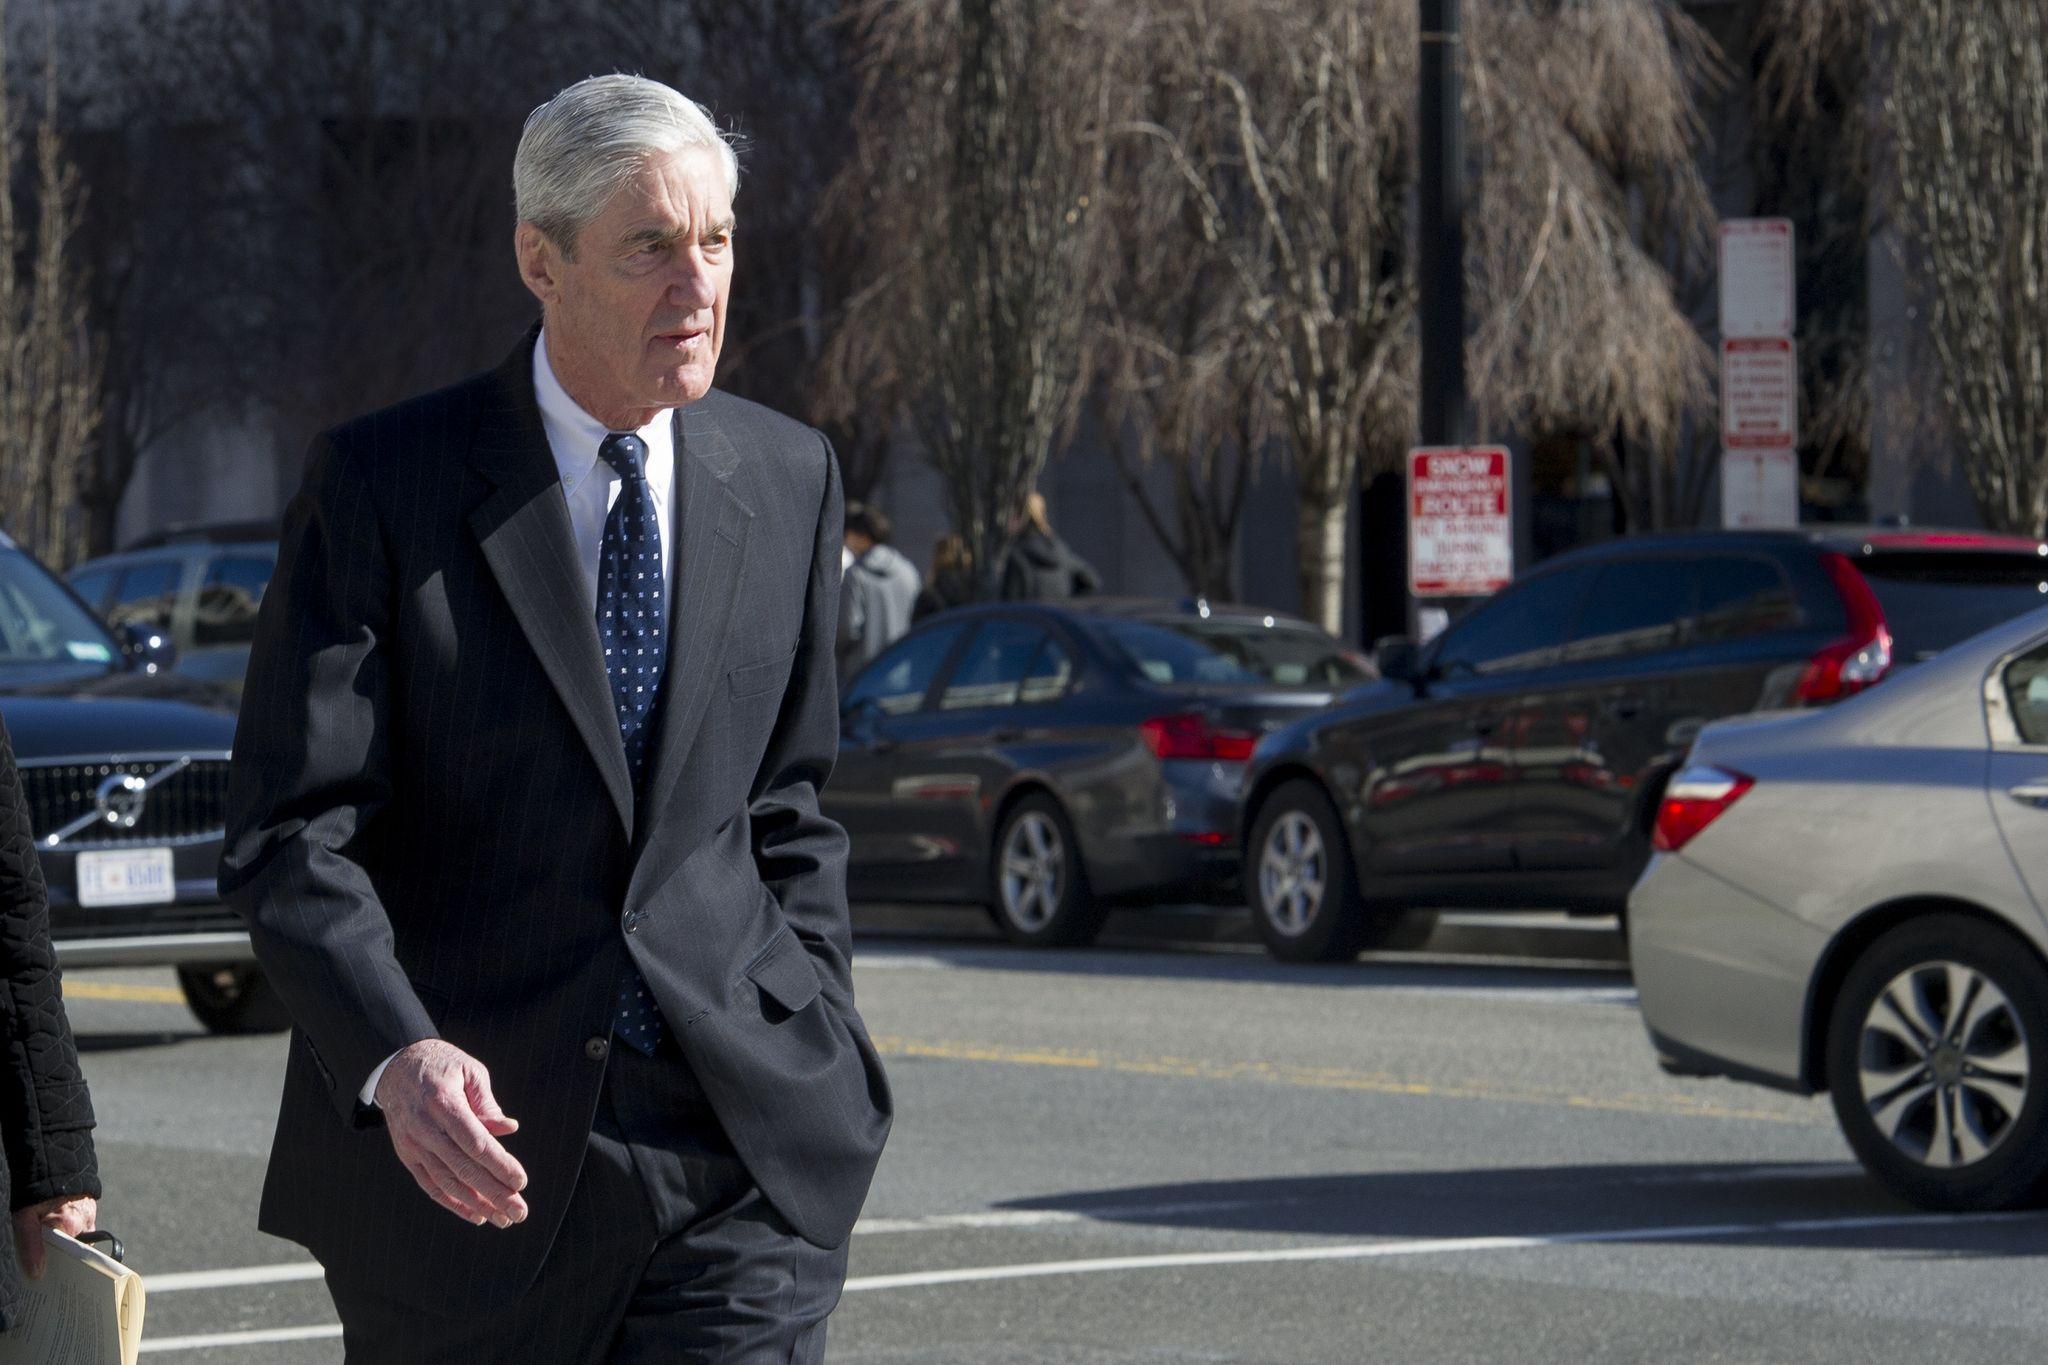 Robert Mueller clears Donald Trump in Russia probe, William Barr says